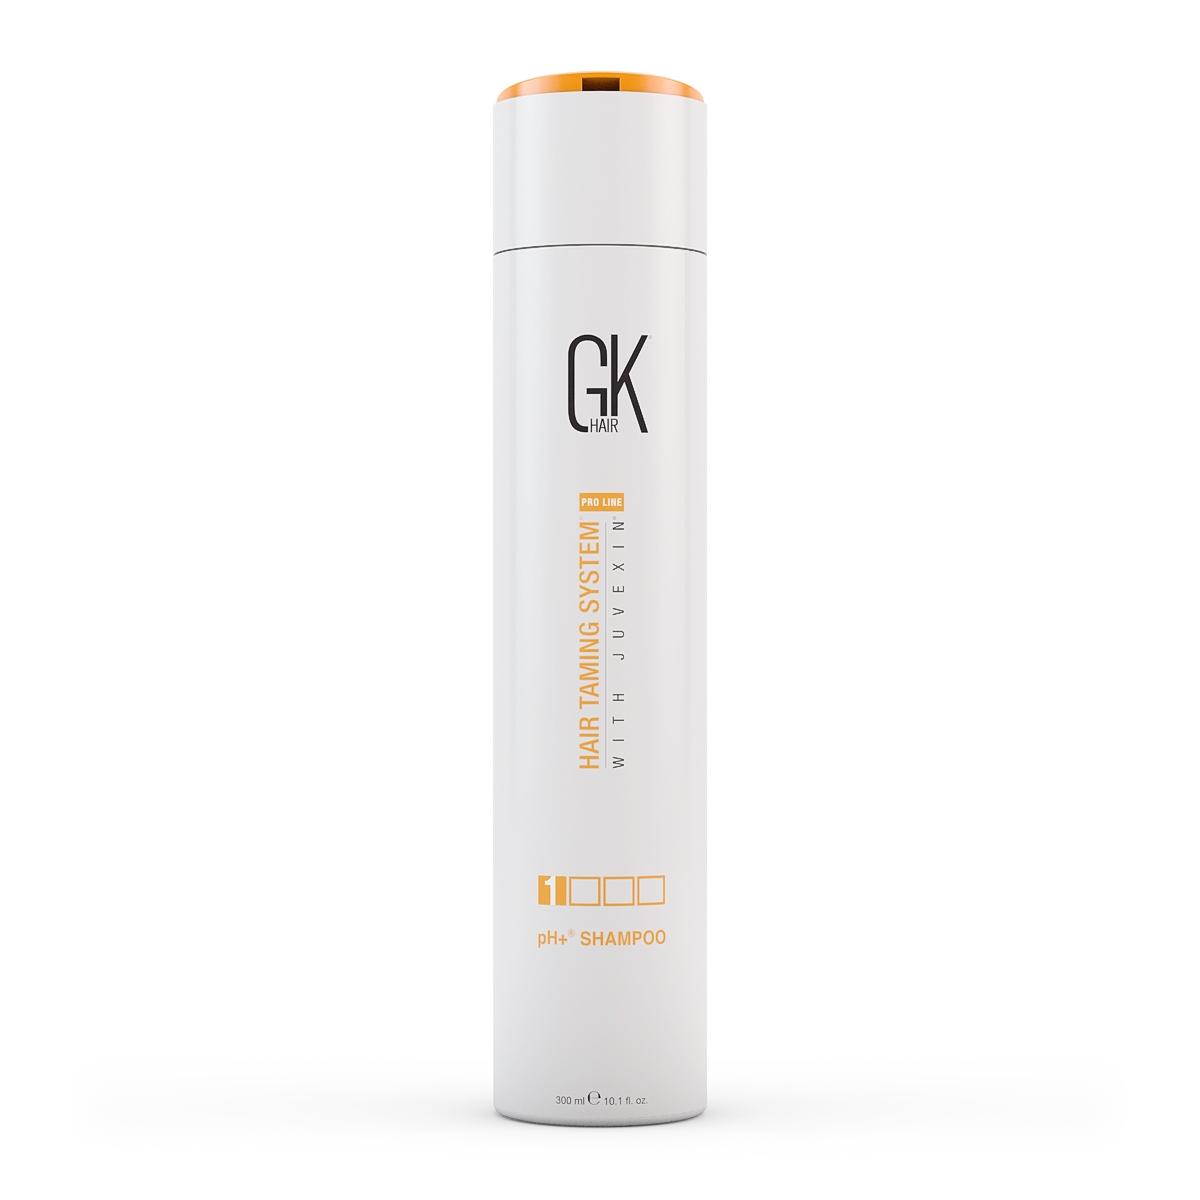 Фото - Global Keratin Очищающий Шампунь Claryfing PH +, 300 мл шампунь для волос ollin keratin royal treatment 100 мл очищающий и обогащающий с кератином